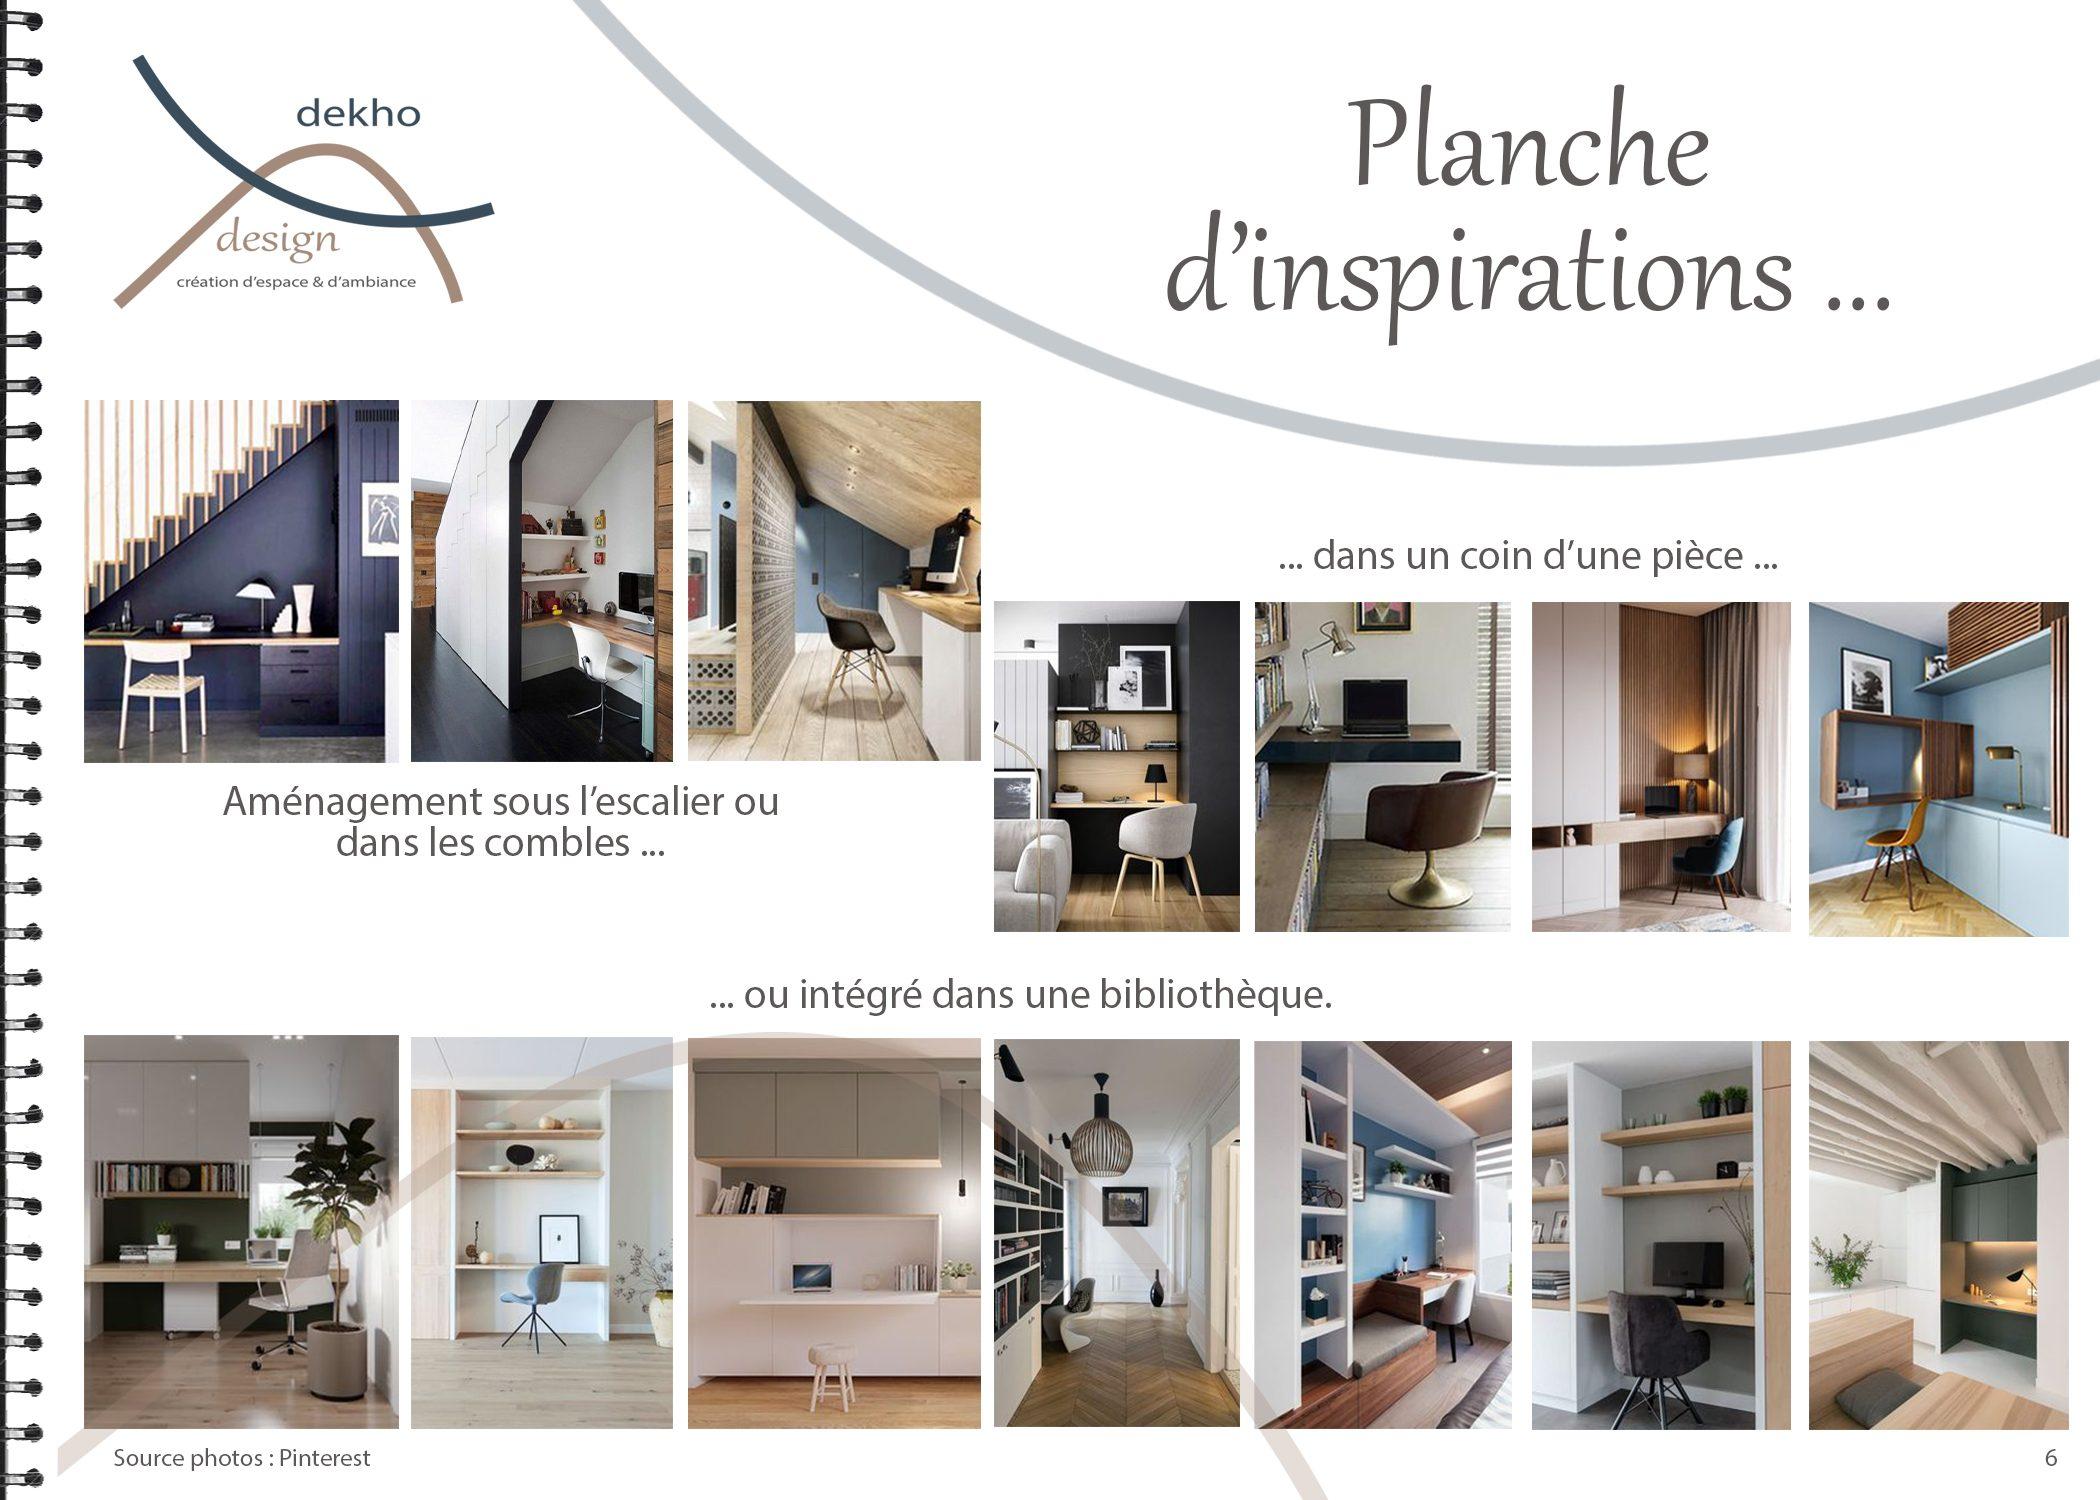 carnet d'intérieur-coin bureau-inspirations-conseils 1-dekho design